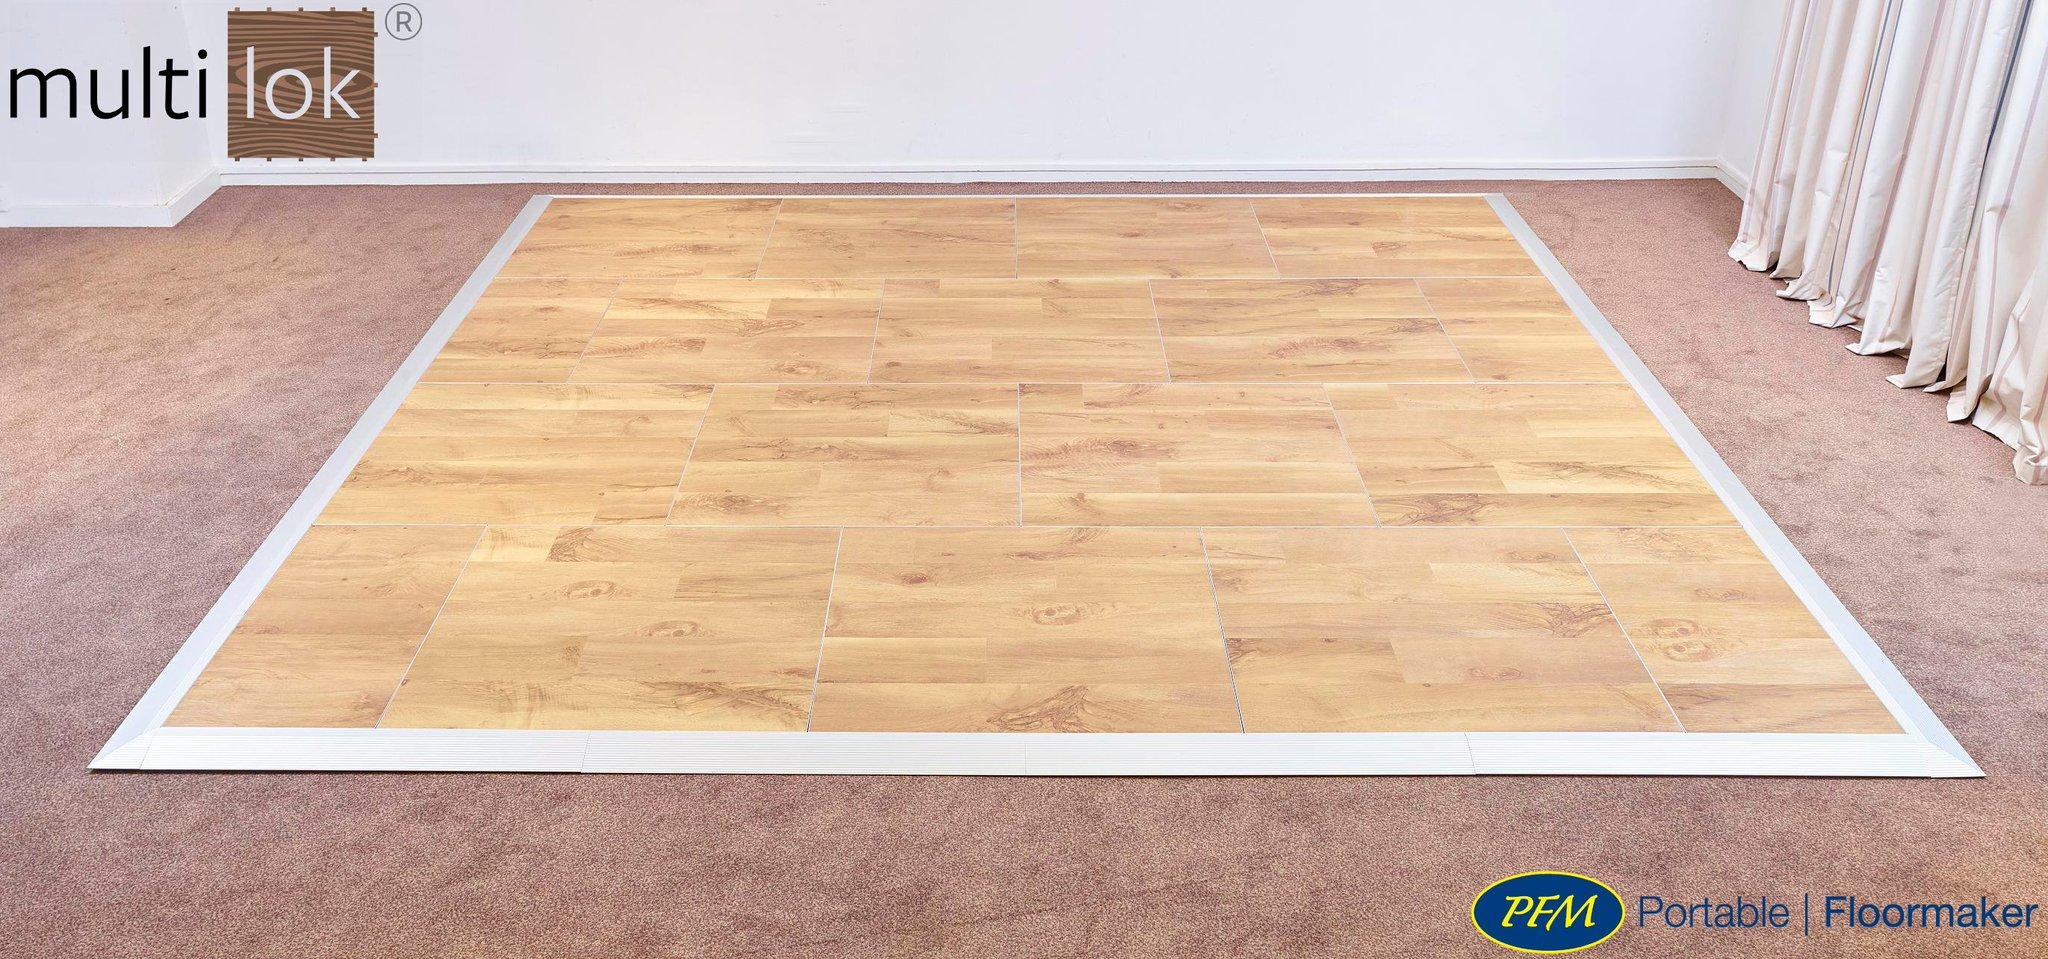 portable piece for a dance floor